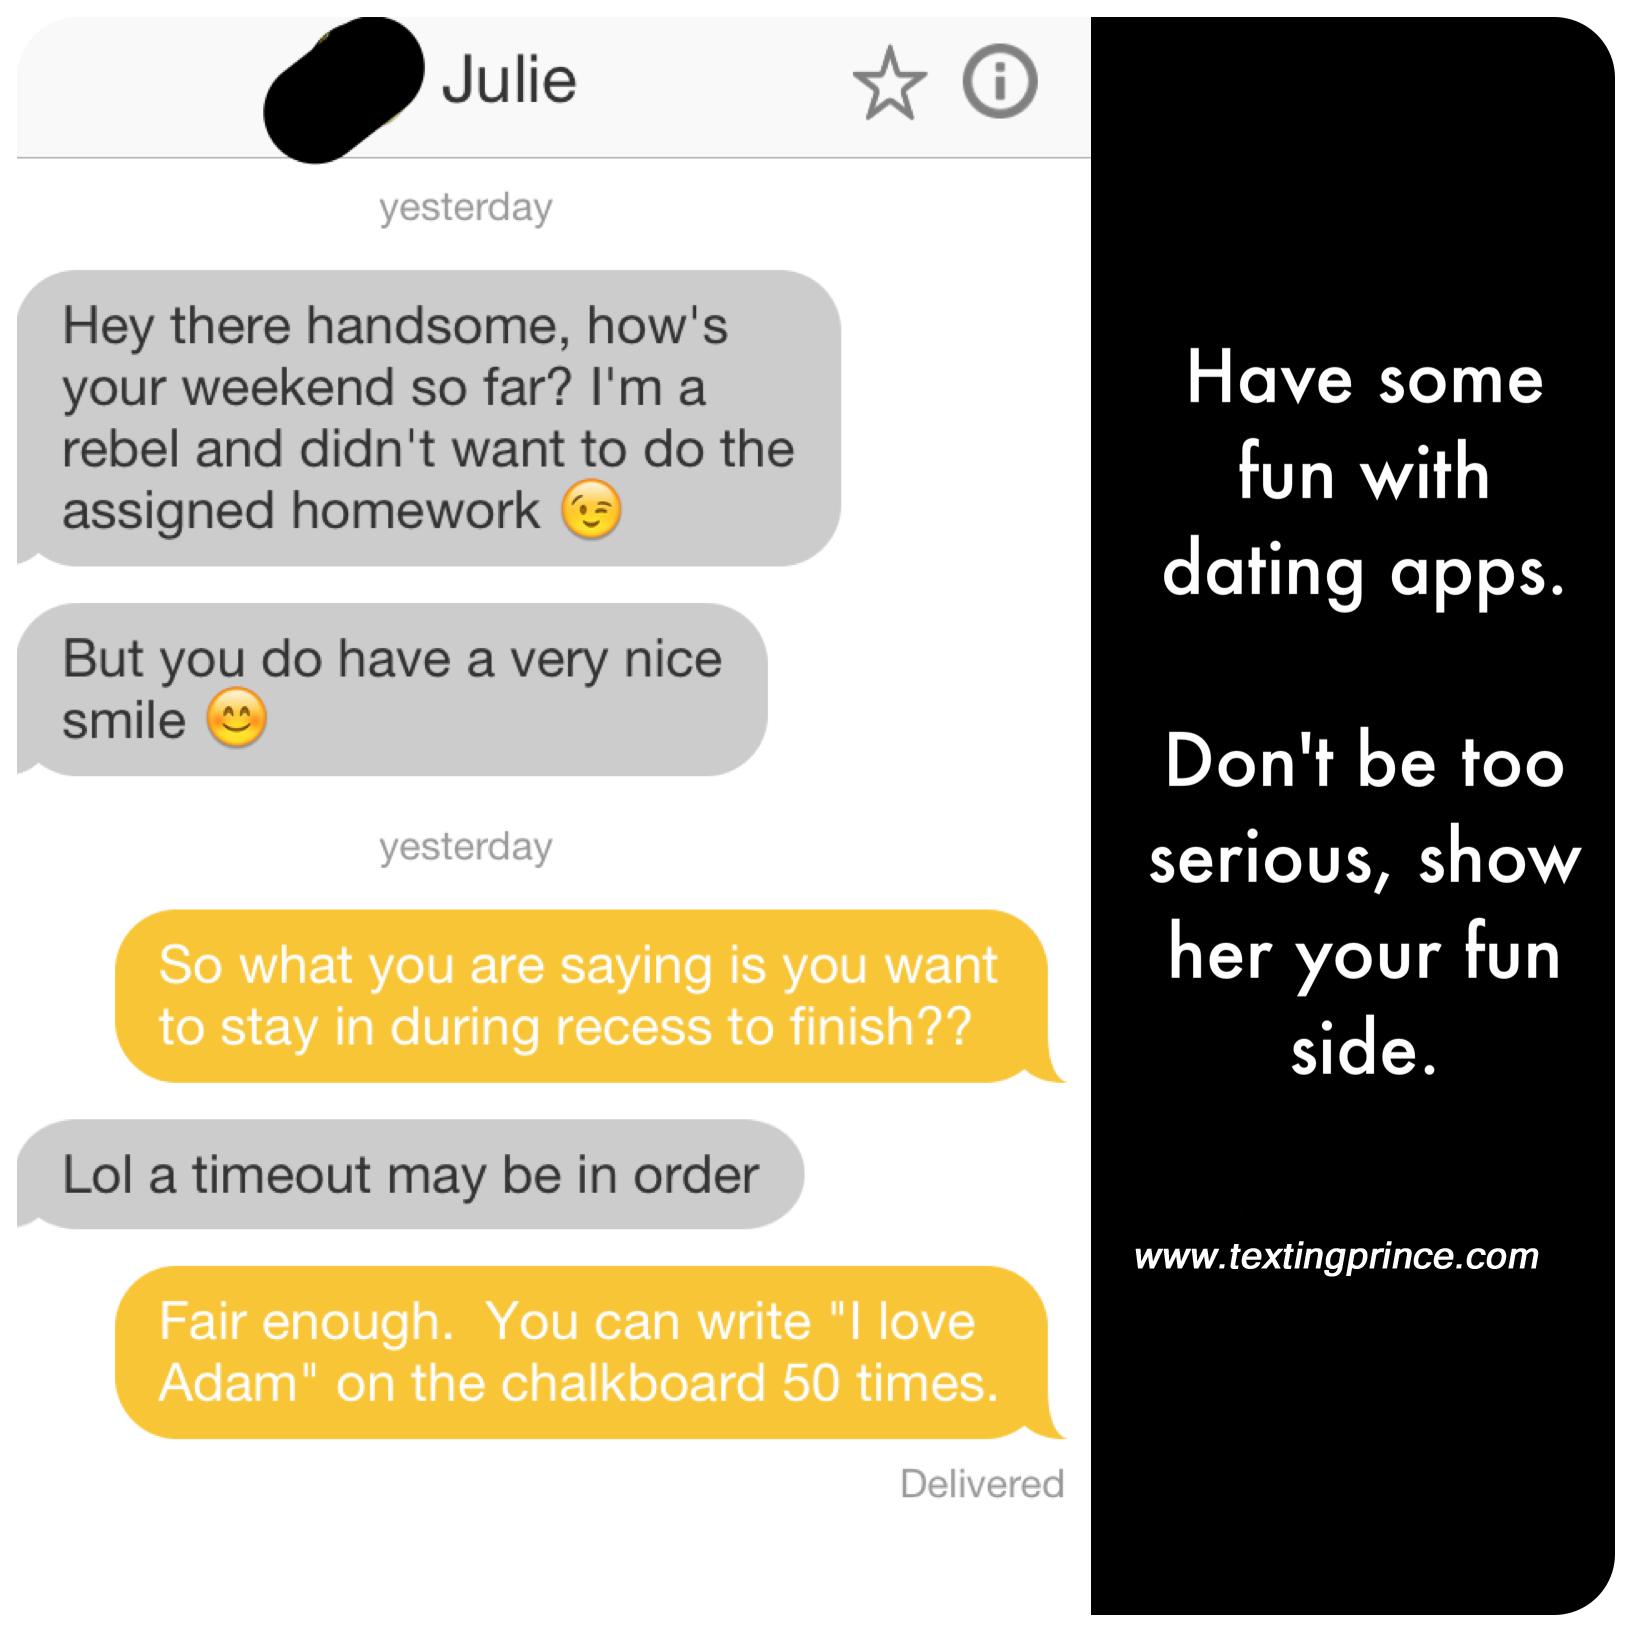 How to Flirt Online